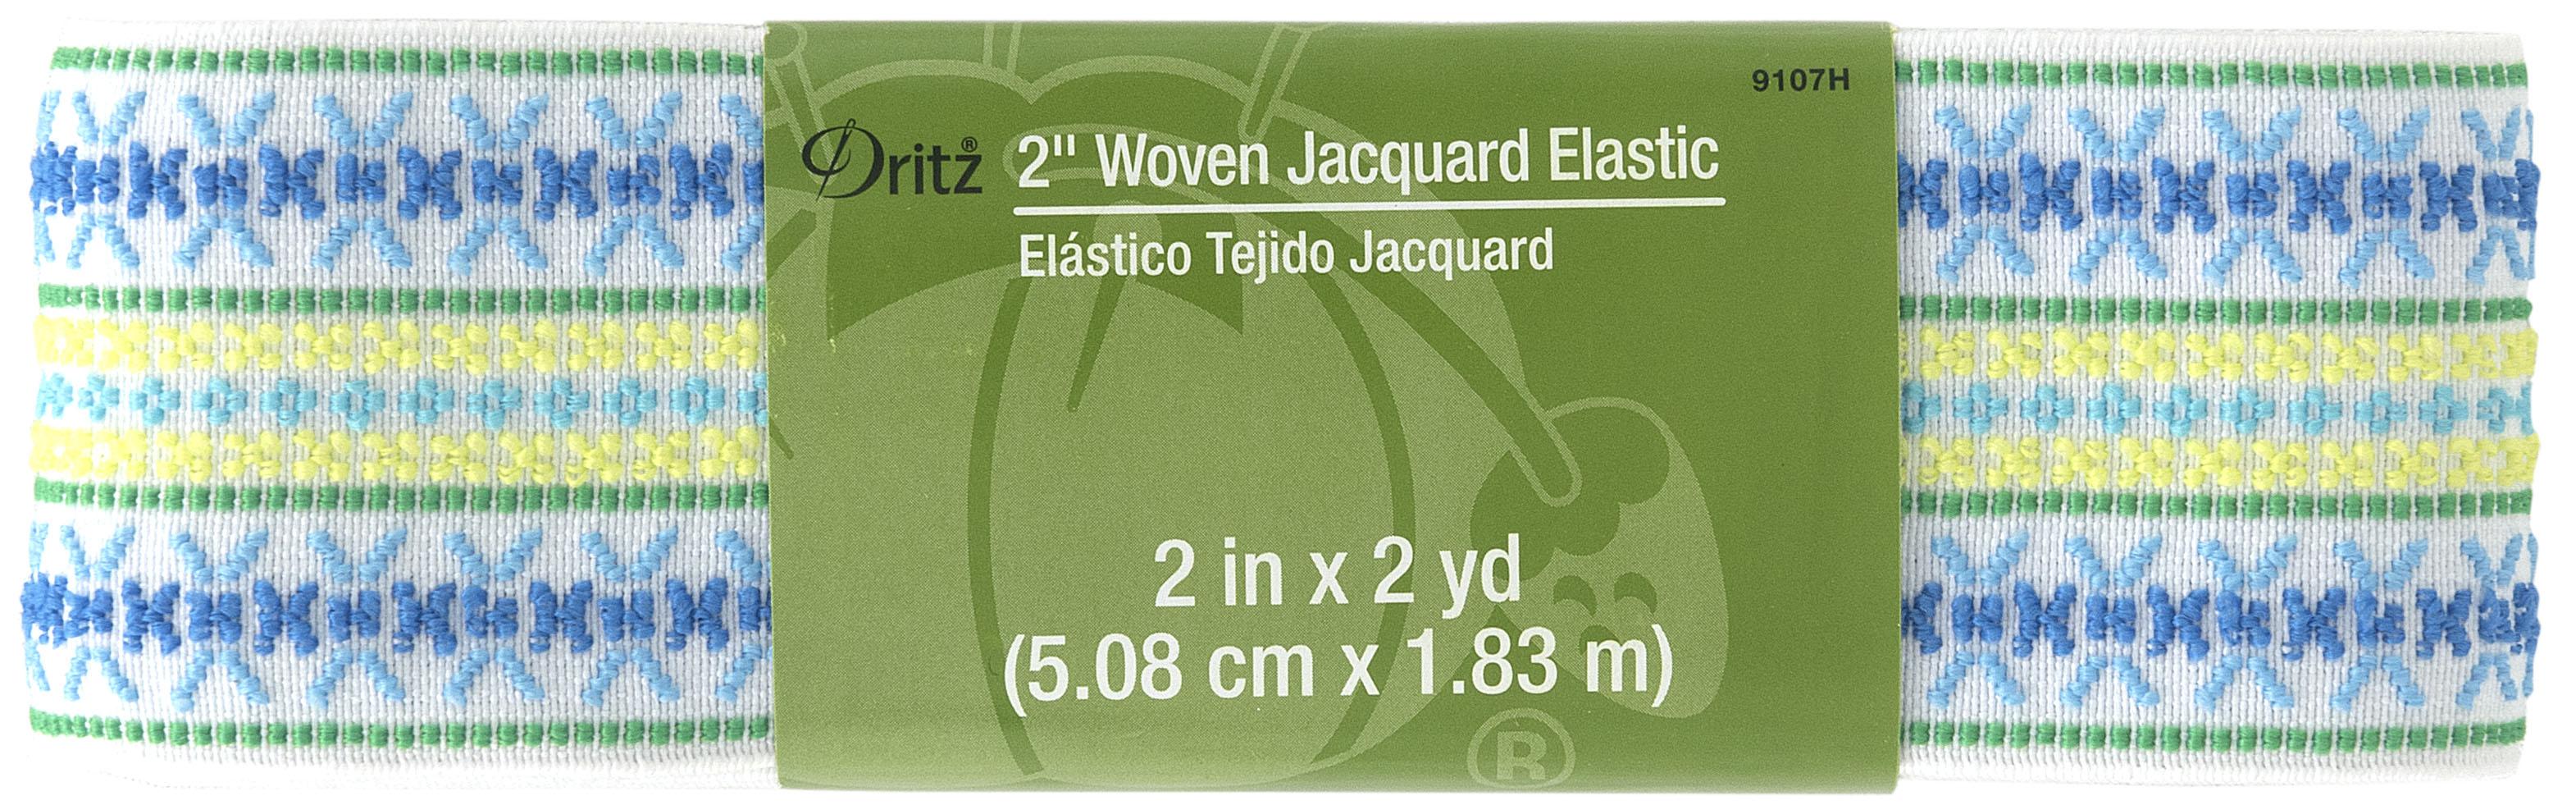 2x2yd Woven Jacquard Elastic White